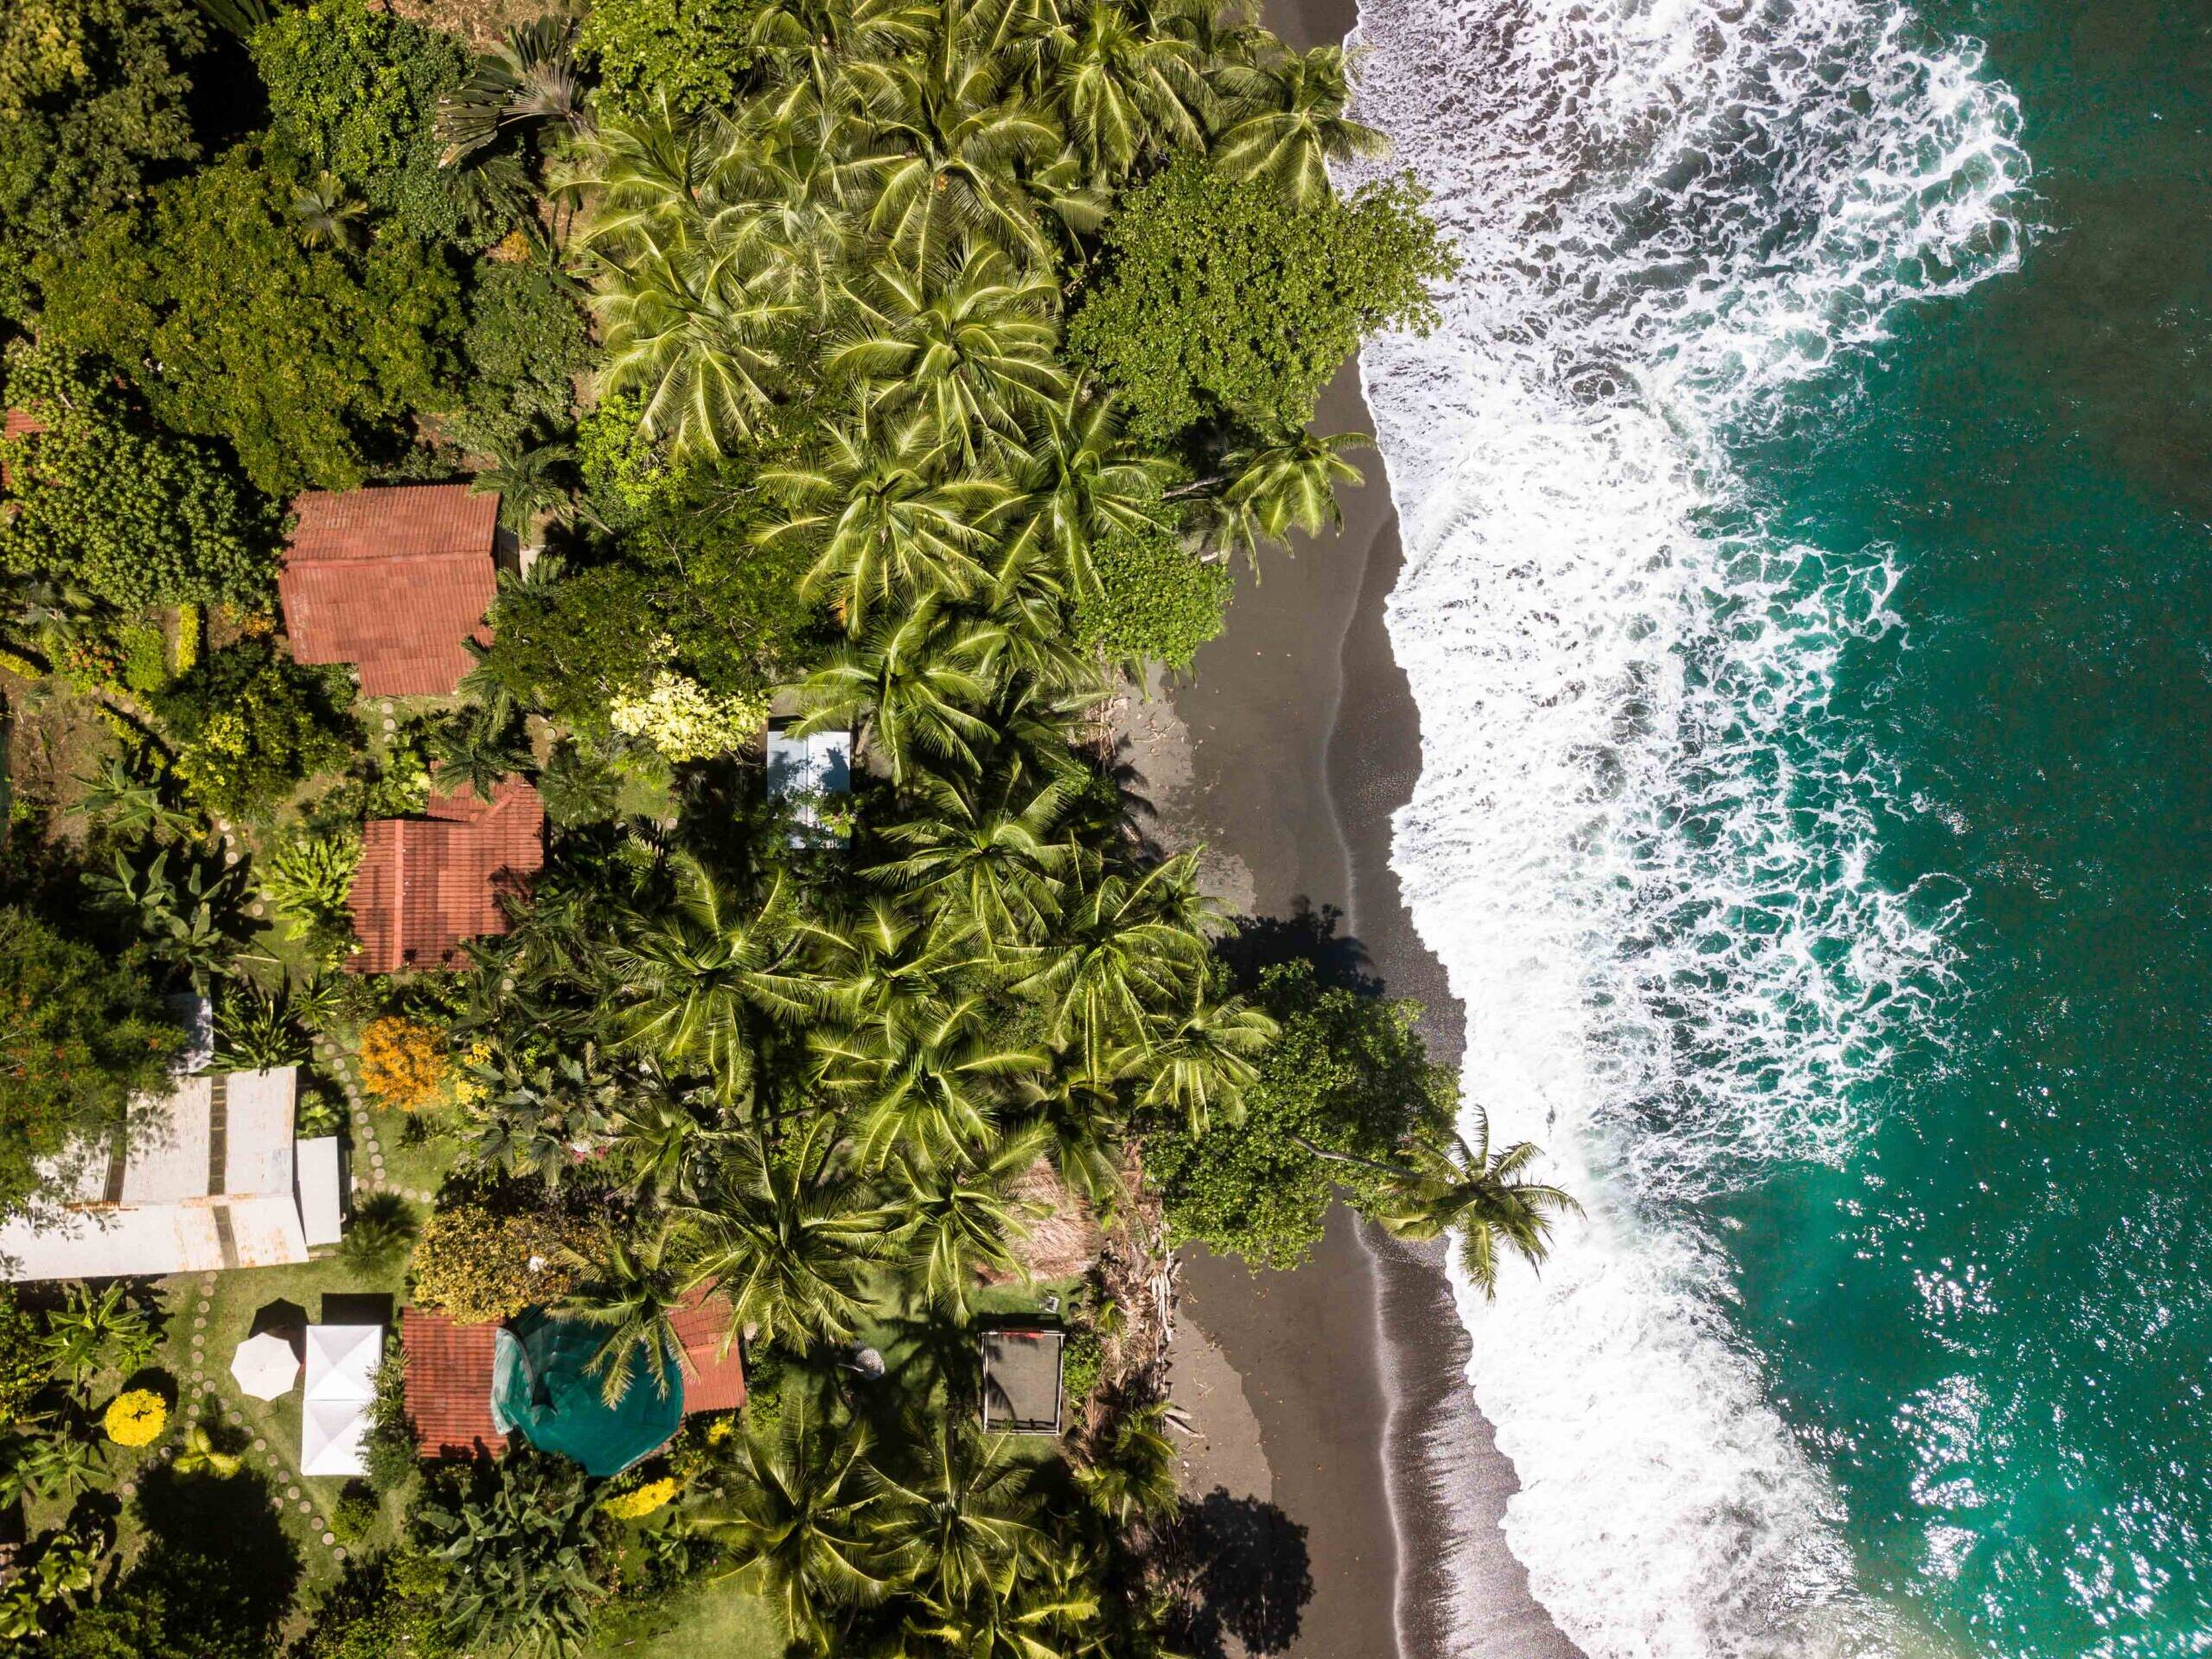 Drone image of Rancho Burica Costa Rica